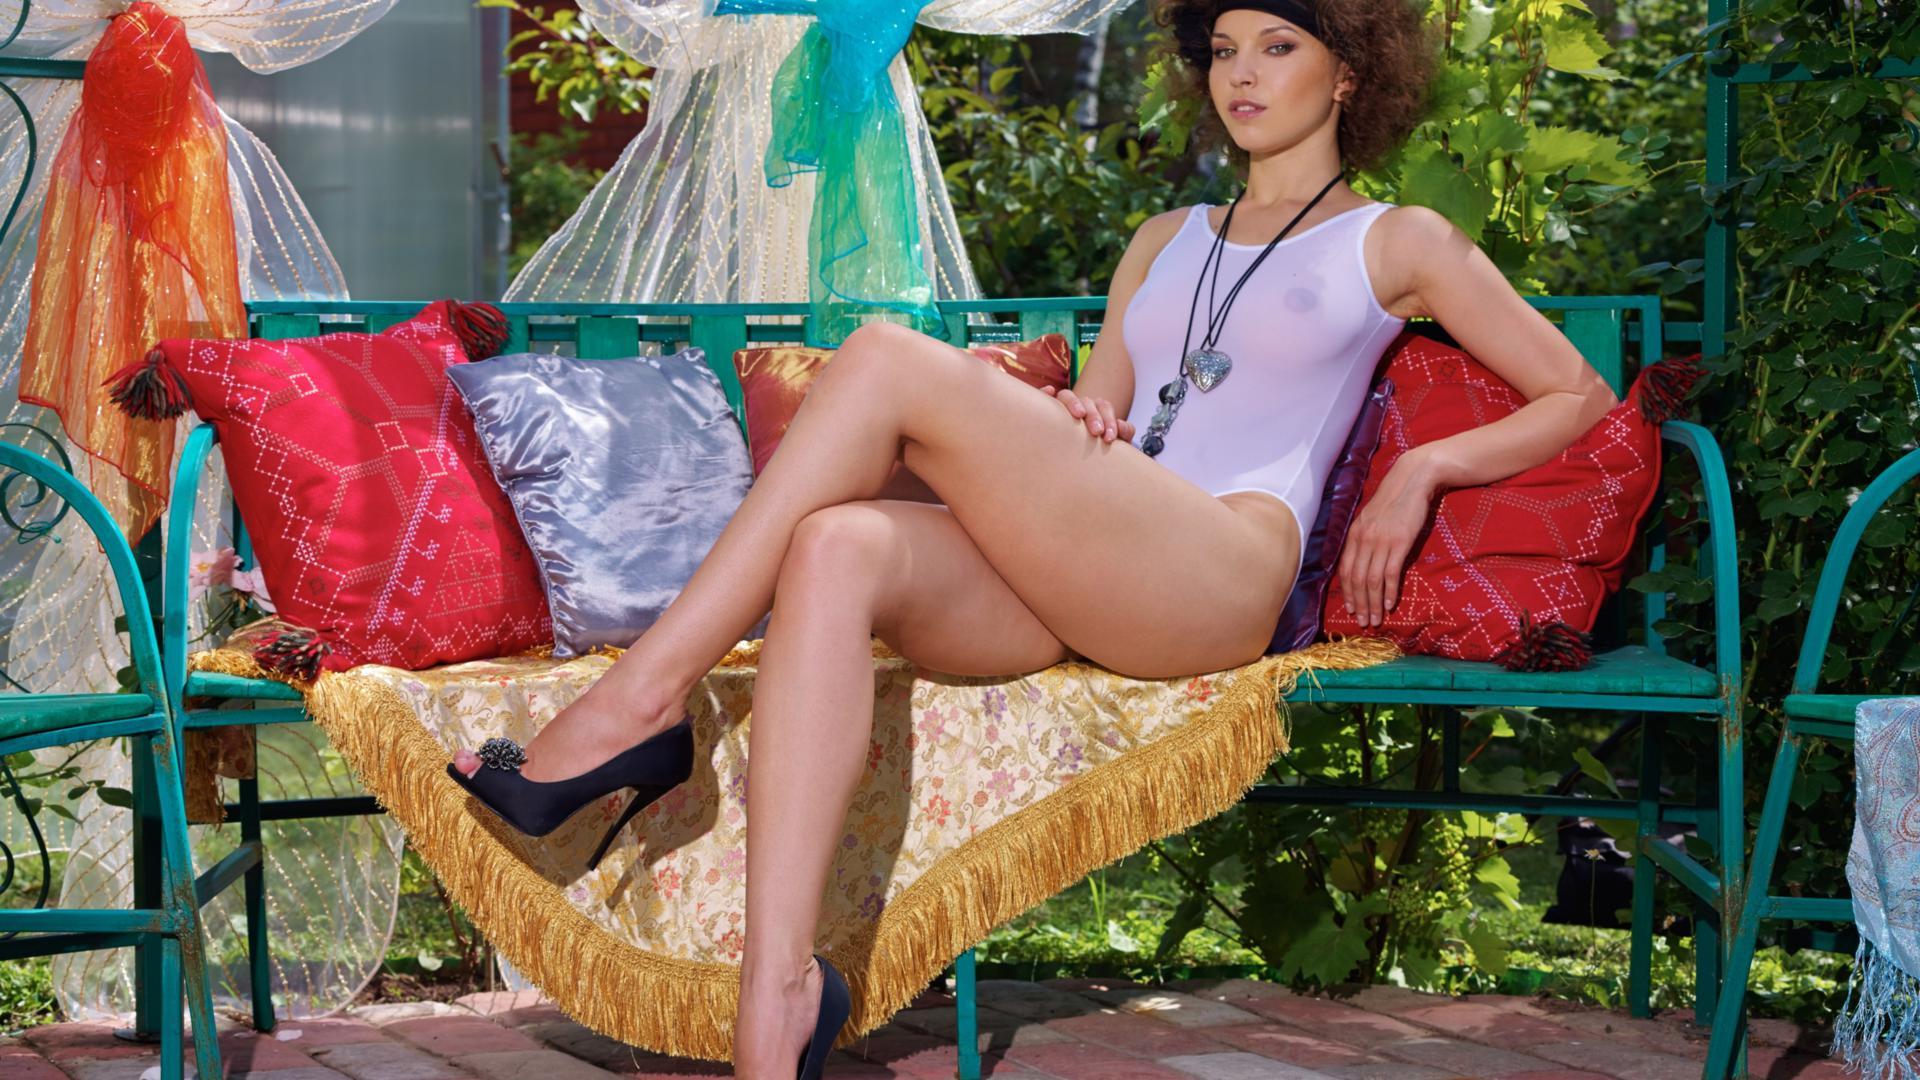 Download photo 1600x1200, anita e, brunette, sexy girl